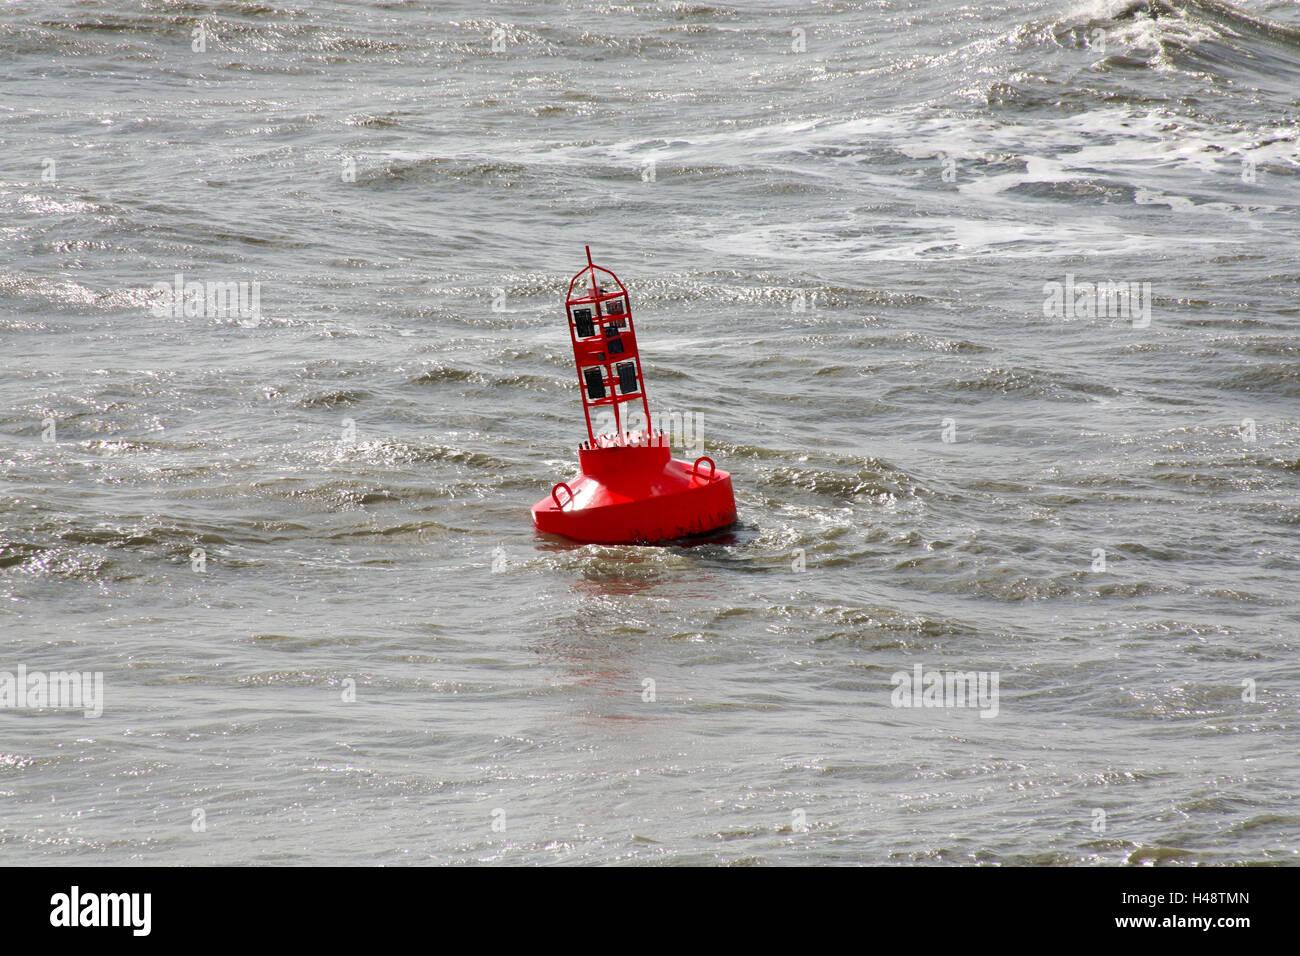 Sea, sea figure, buoy, - Stock Image